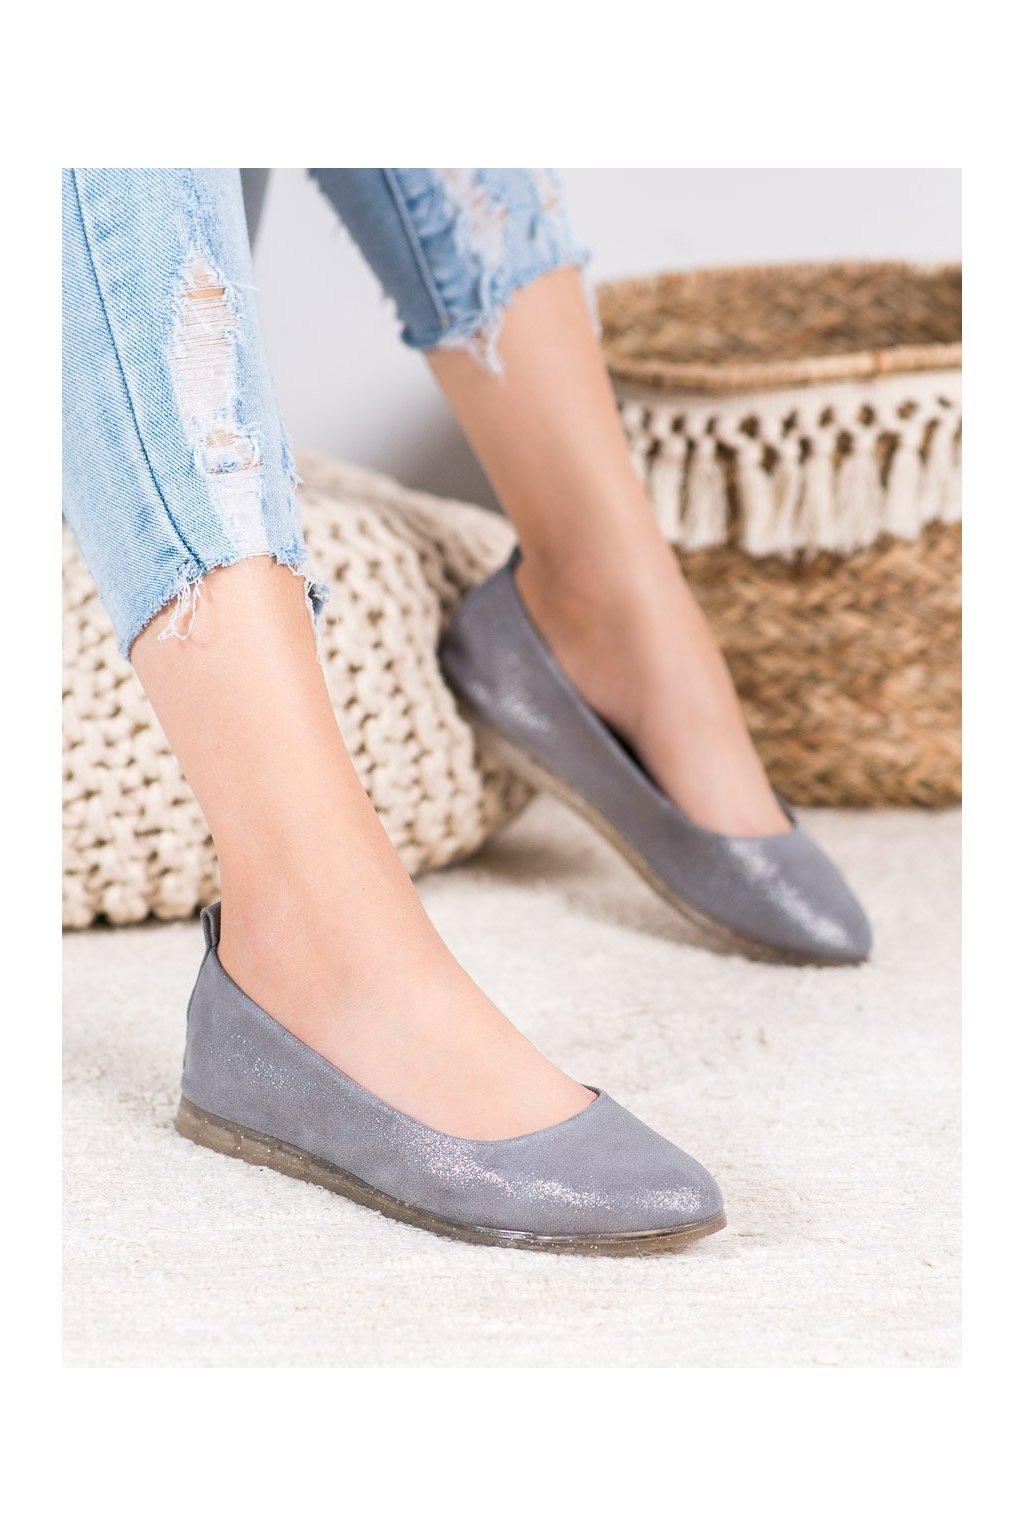 Sivé topánky Sergio leone kod BL602-02G